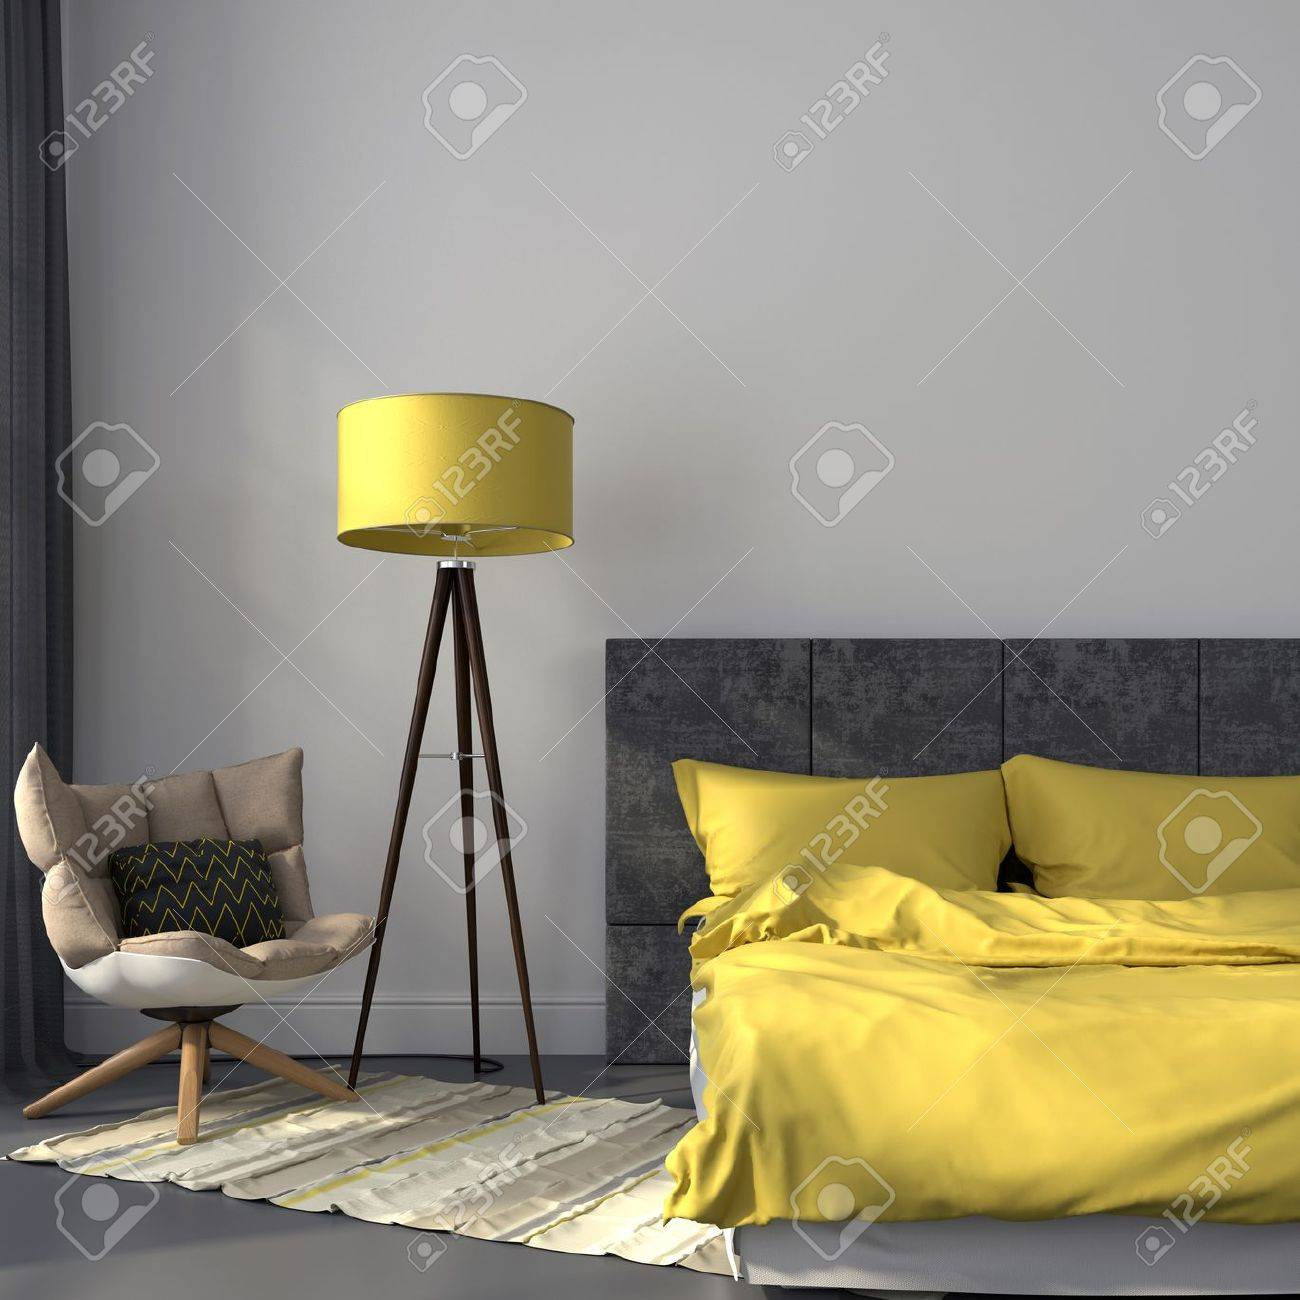 Moderne Slaapkamer In Grijze Kleur En Accenten Op Gele Lamp En ...